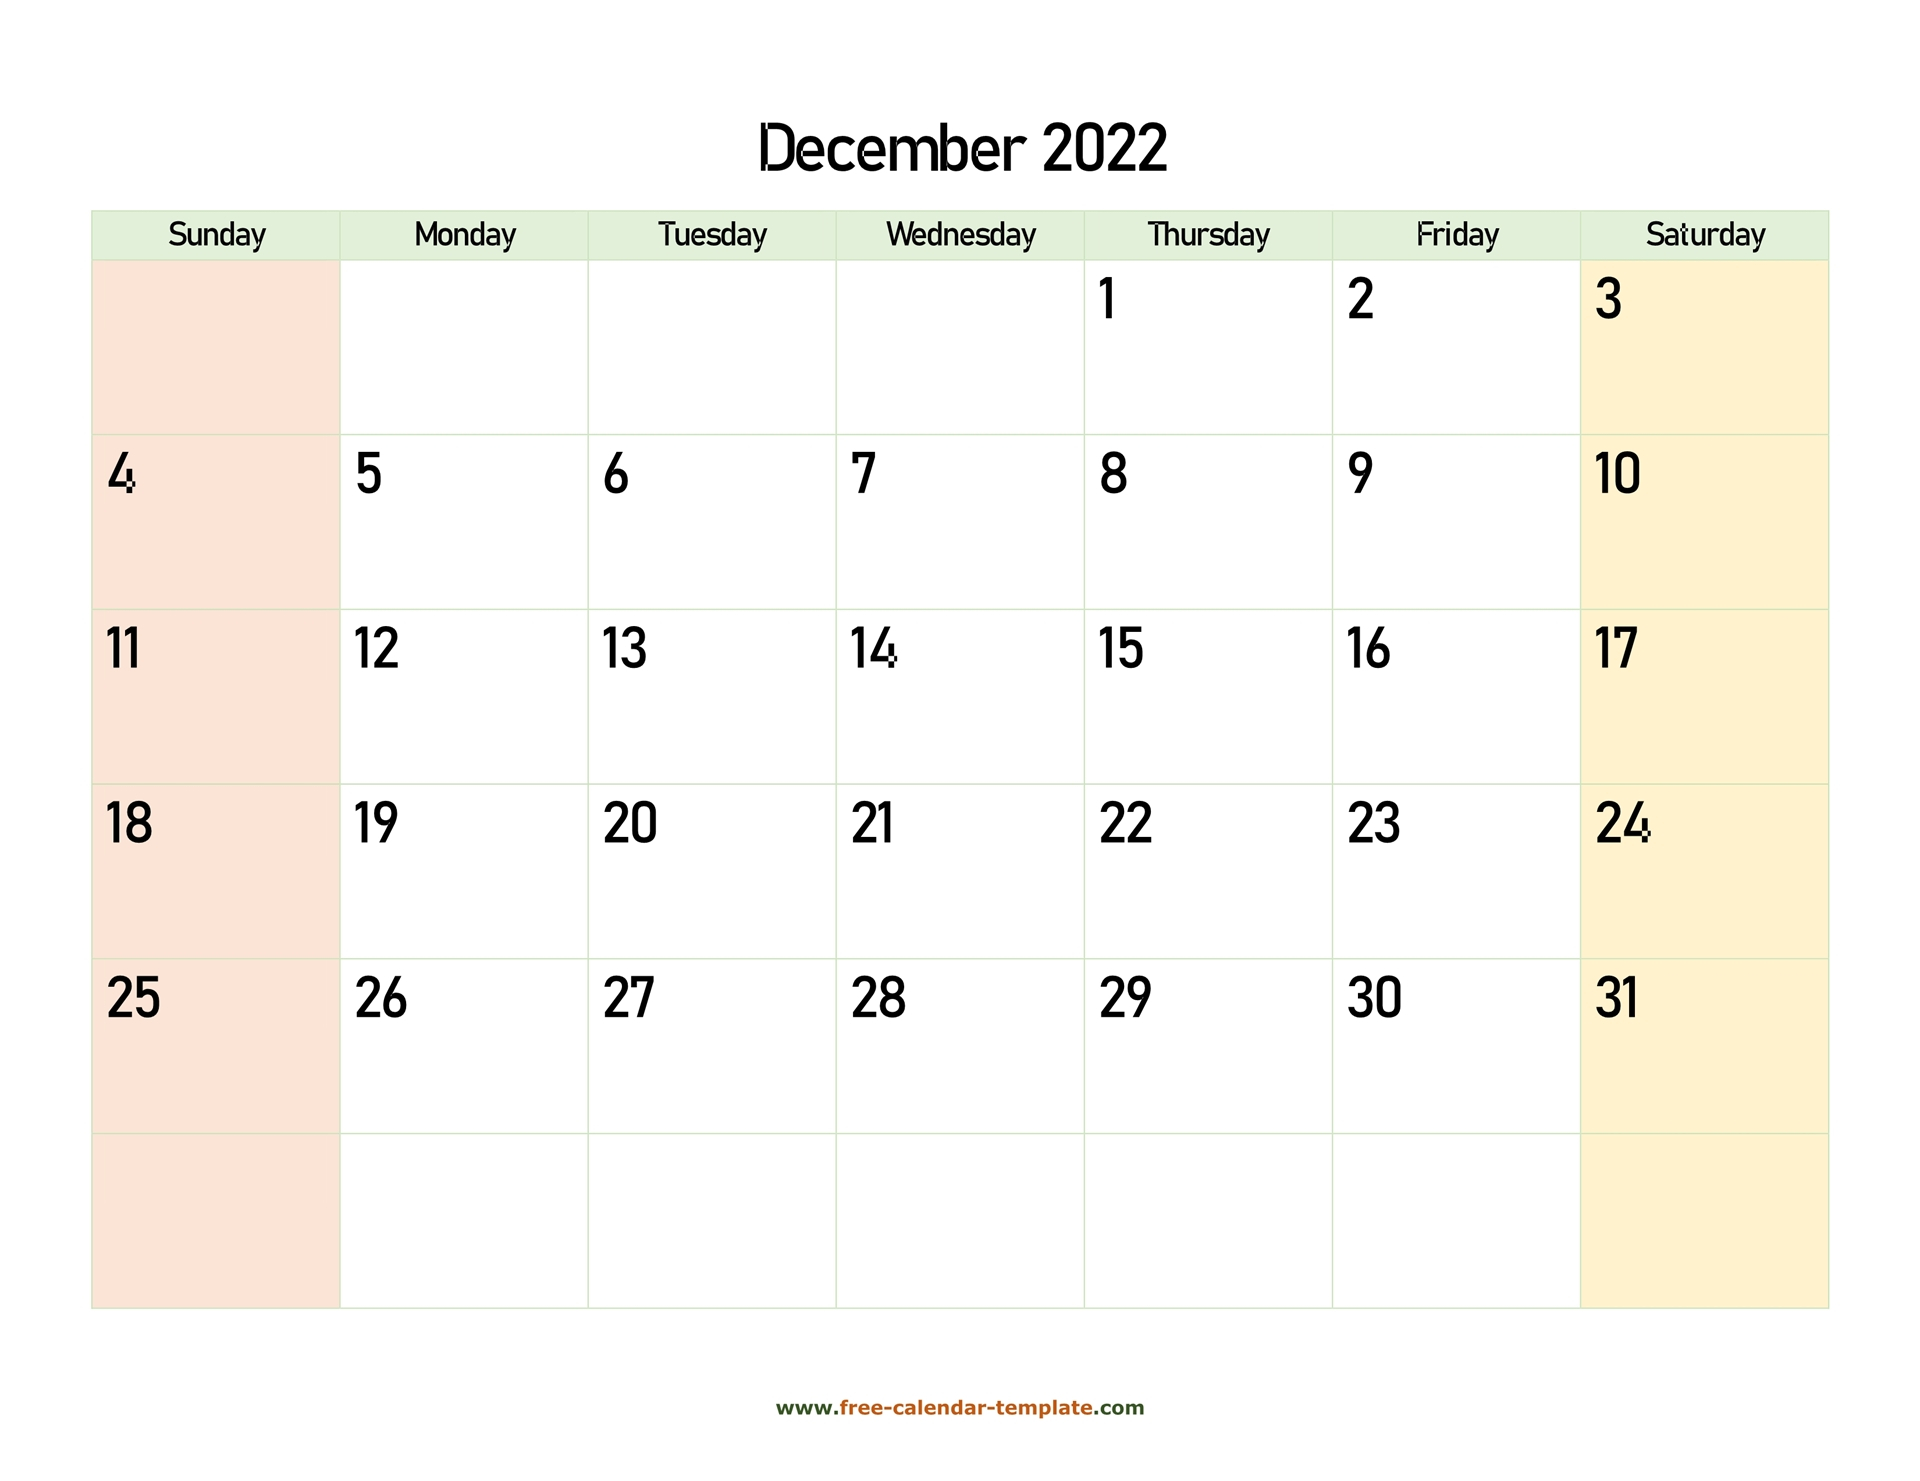 December 2022 Free Calendar Tempplate   Free Calendar Regarding December January Calendars 2022 2022